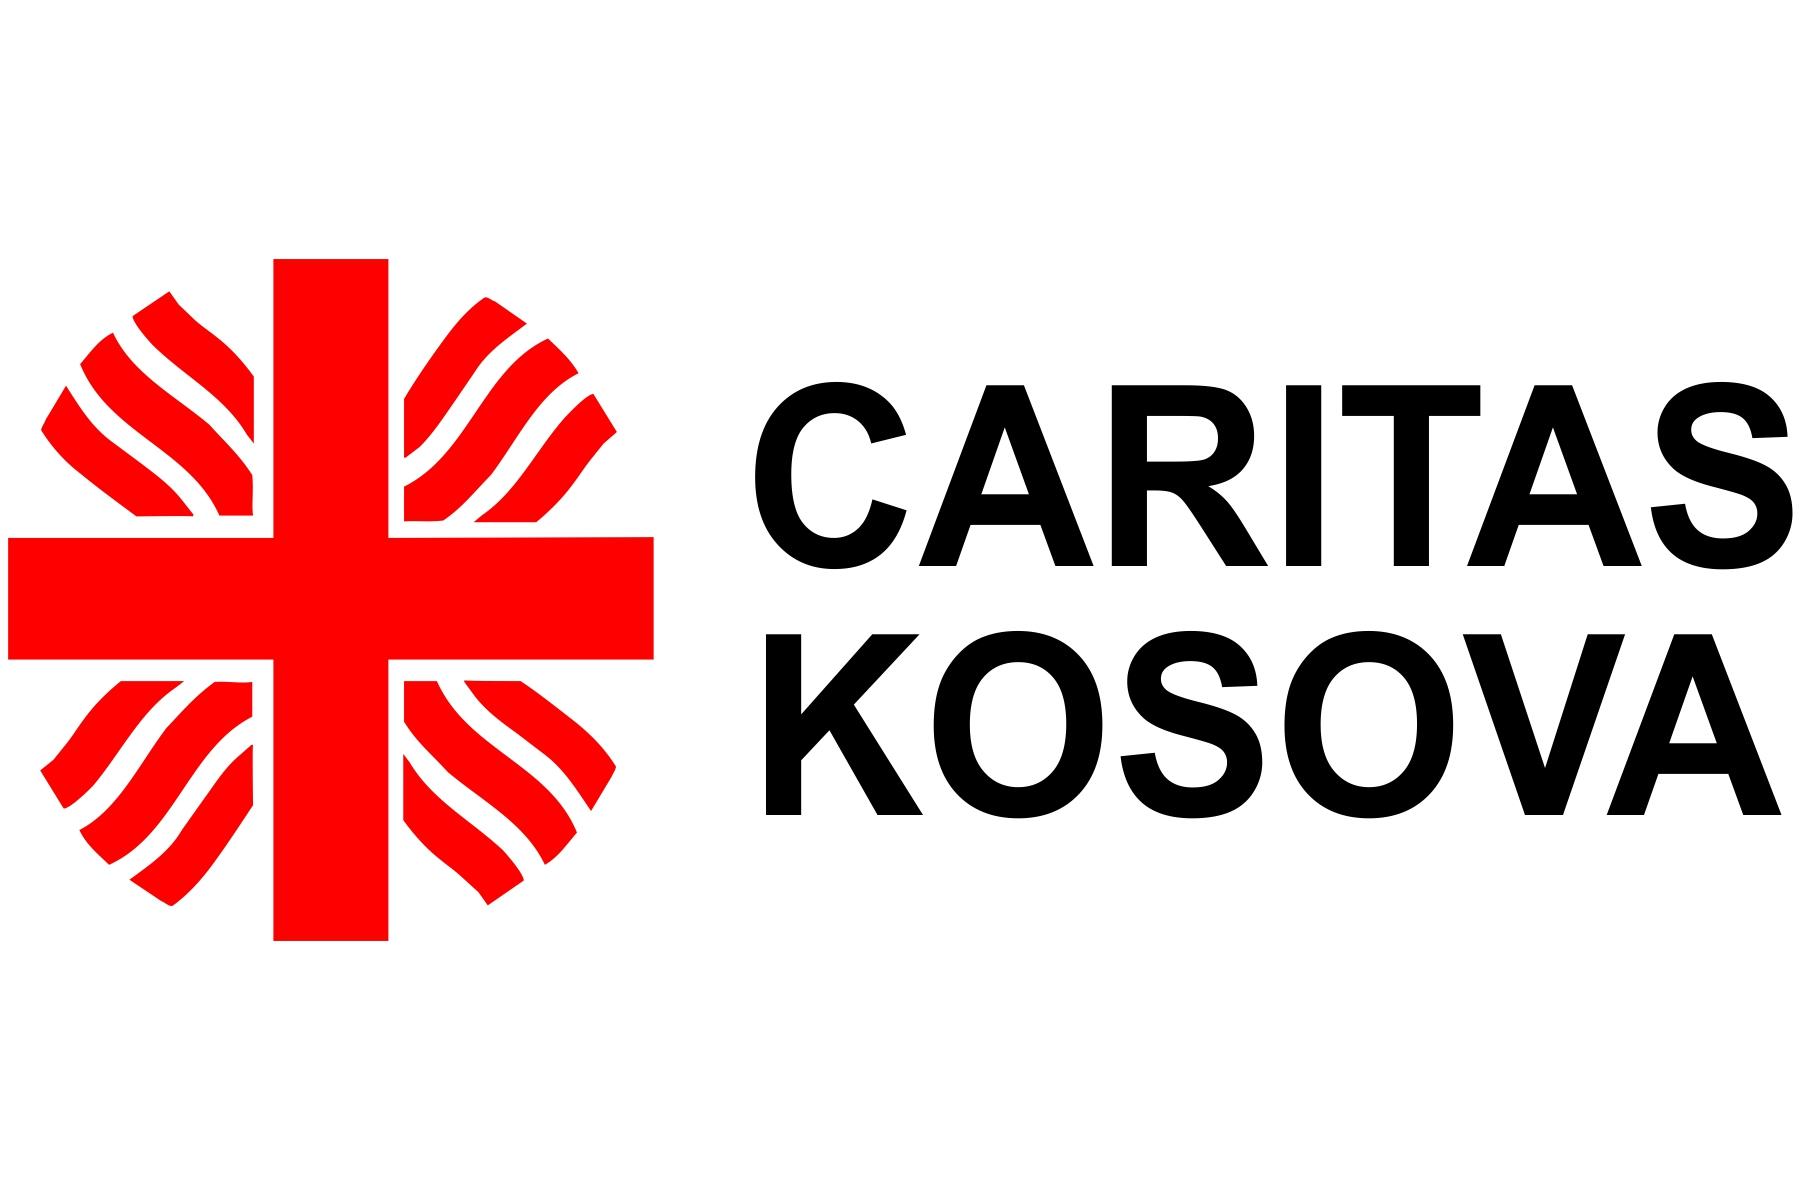 Caritas Kosova